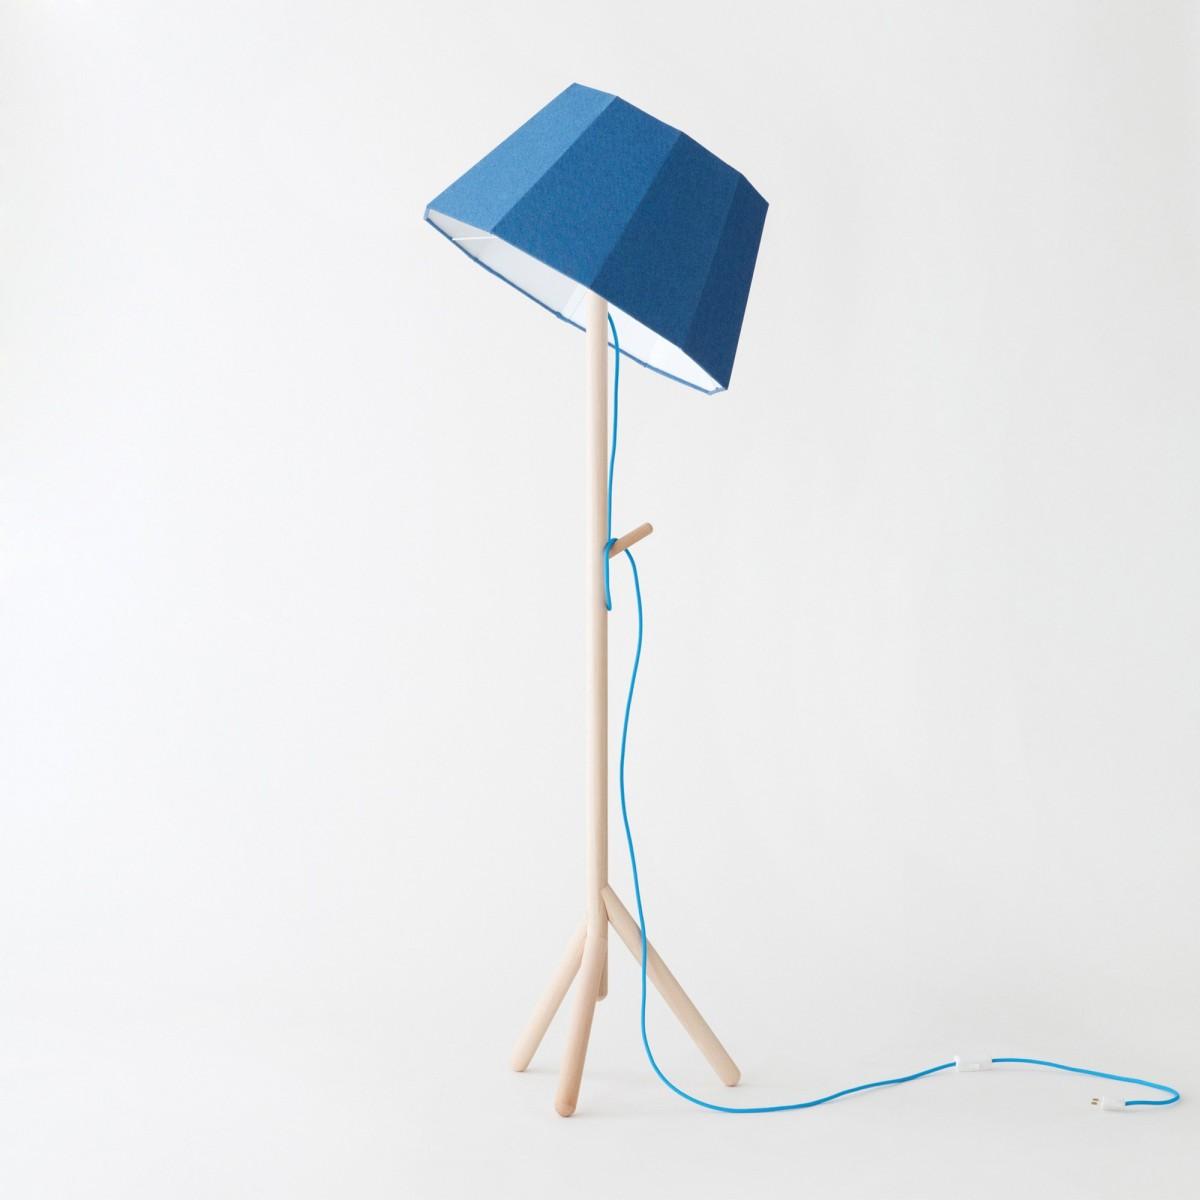 lampadaire bleu faces inclinable colonel. Black Bedroom Furniture Sets. Home Design Ideas